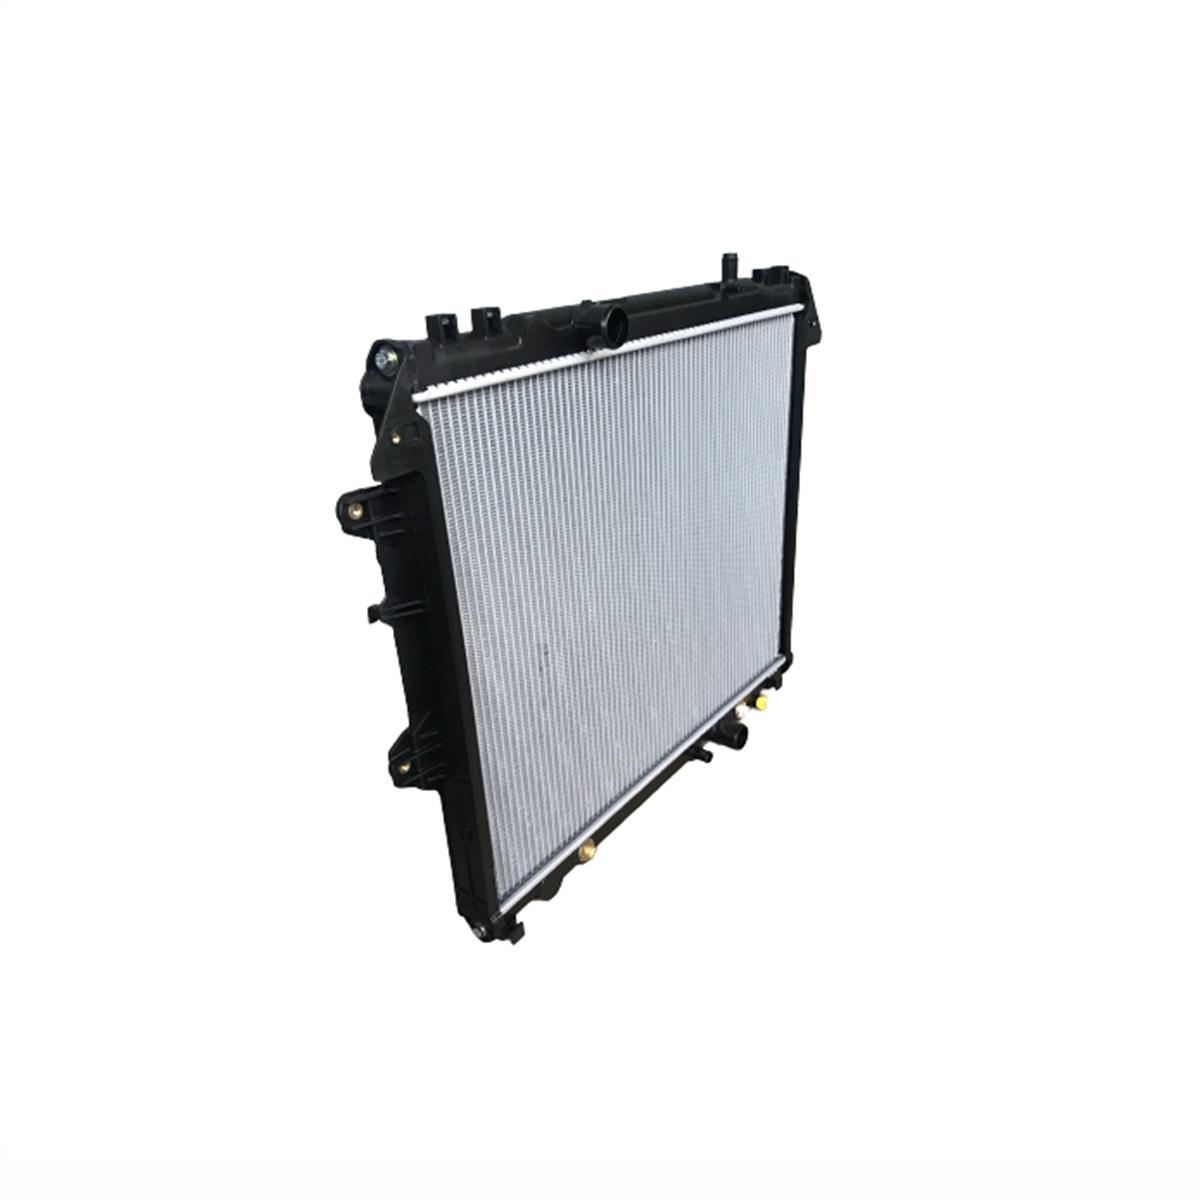 Radiador de Agua Toyota - Hilux 2.5/3.0 Diesel C/Ar Manual/Automático 2006/2015